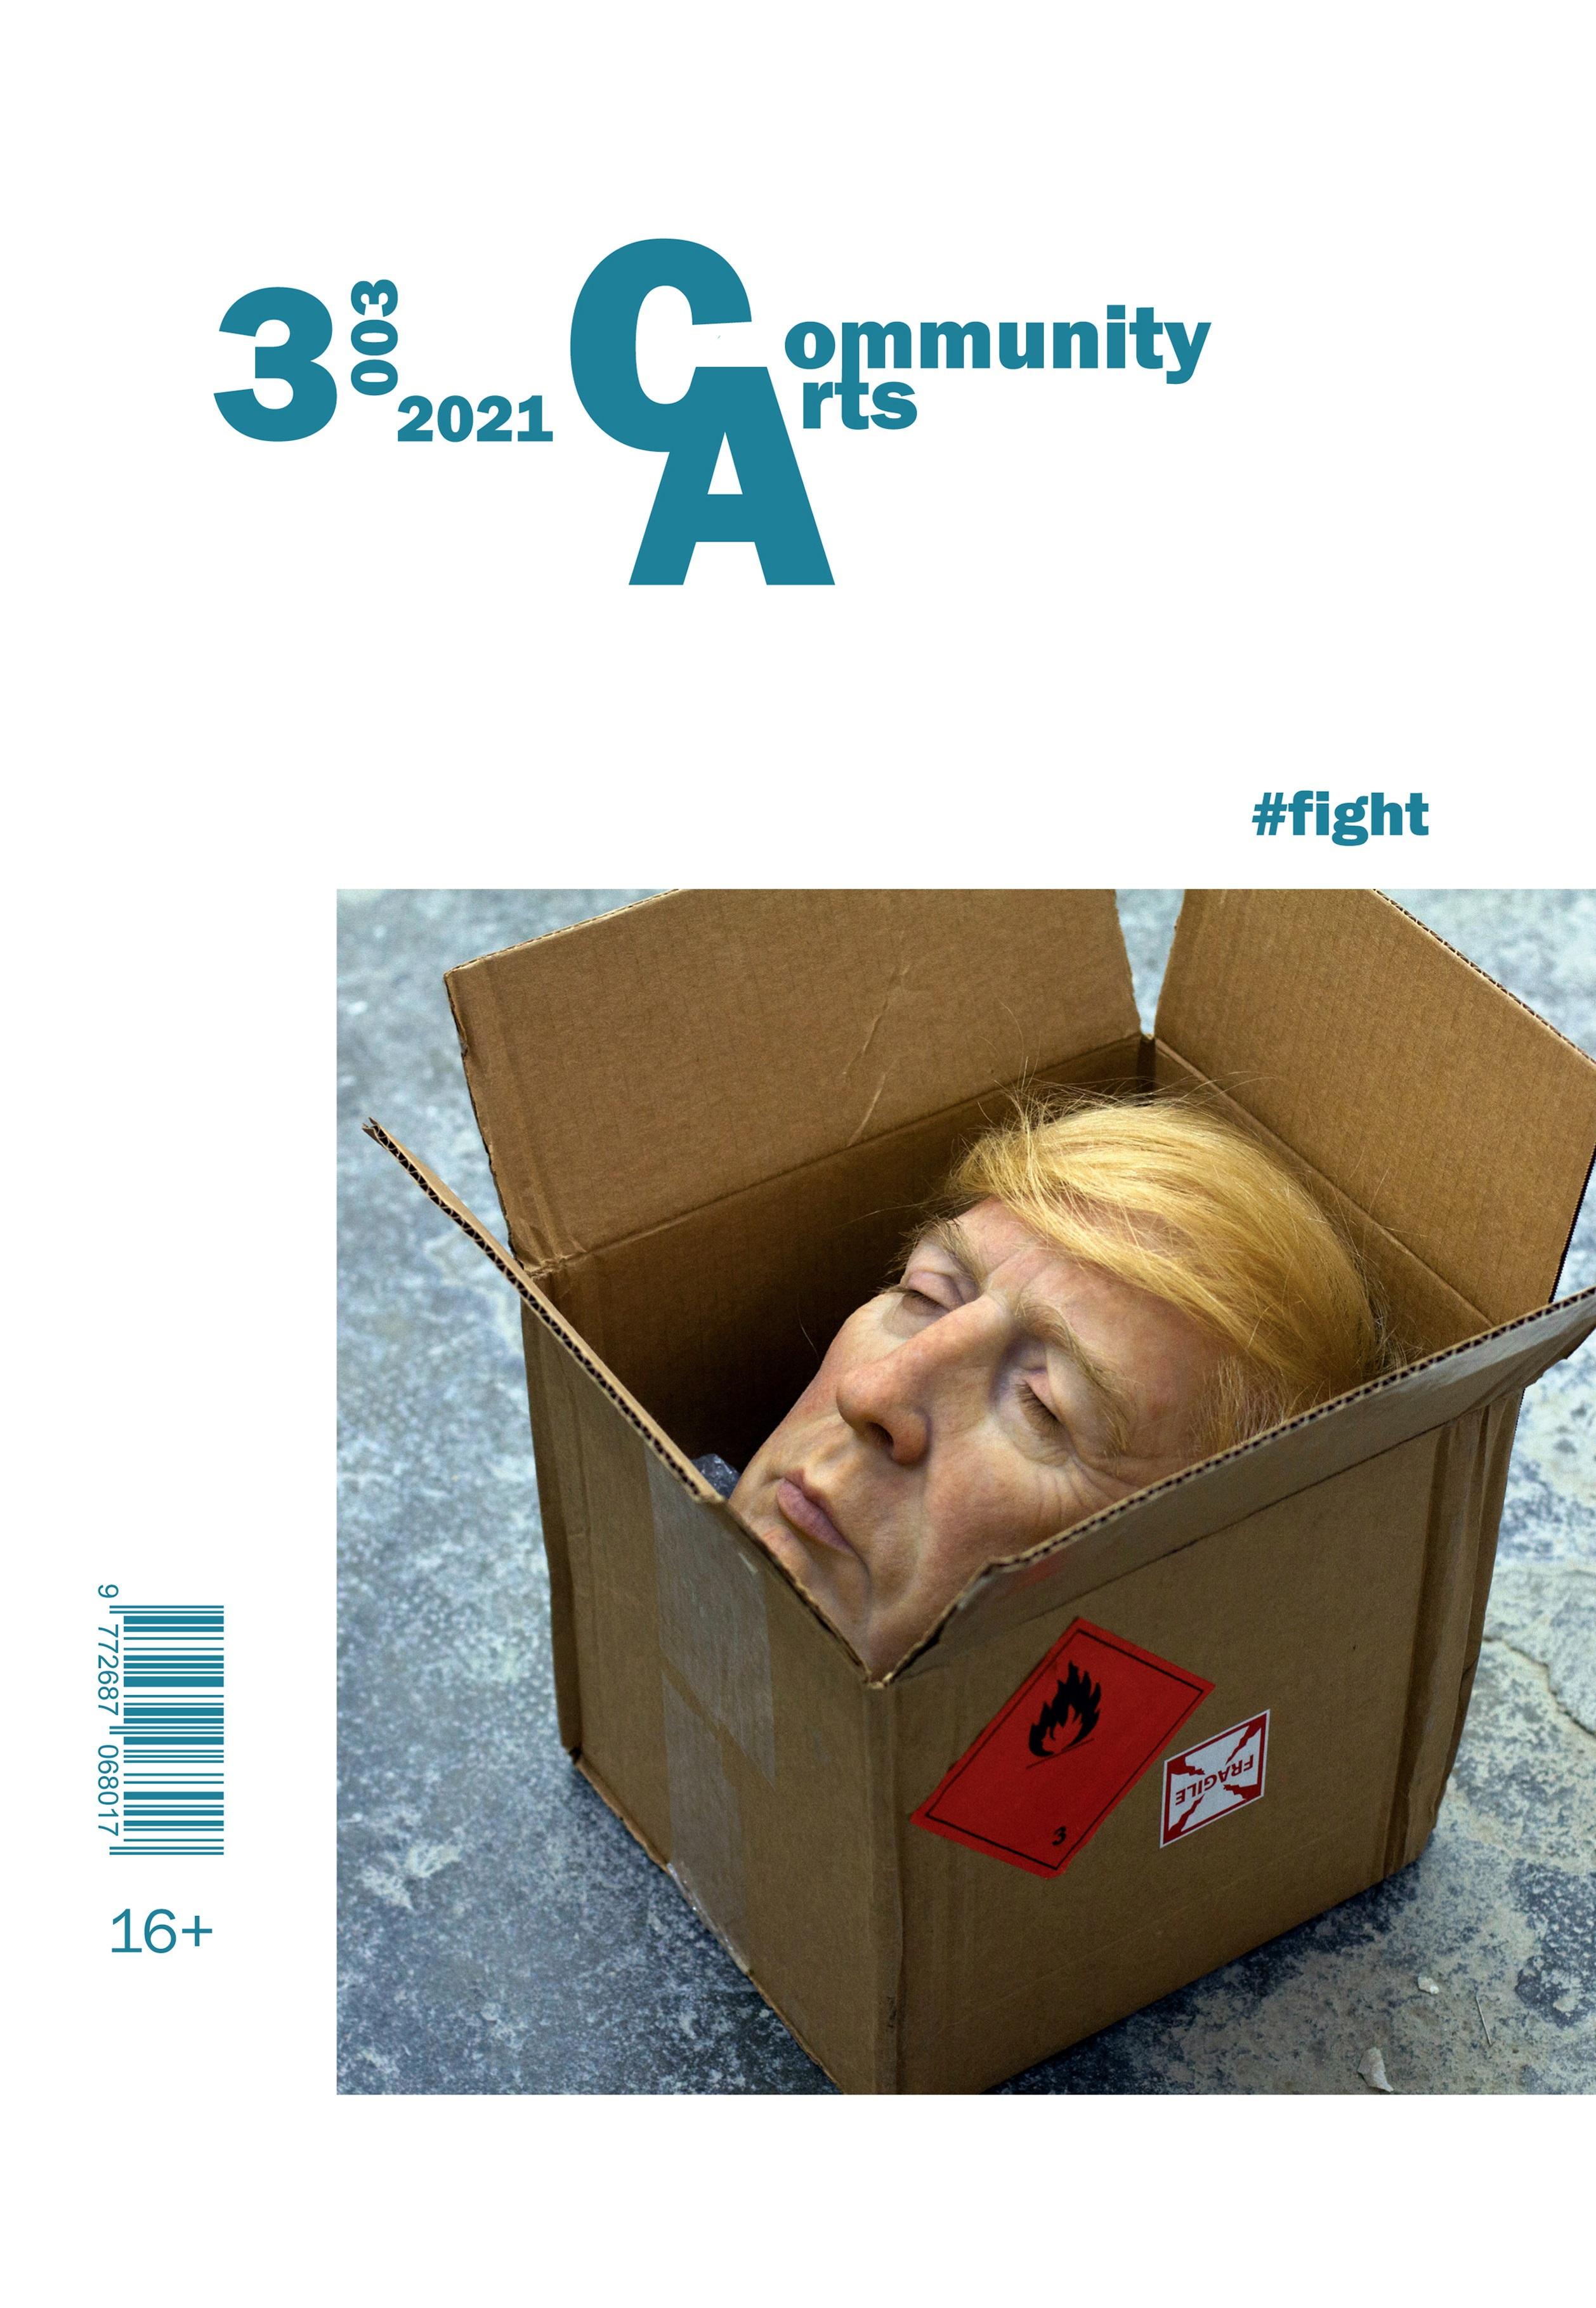 Community Arts № 3 (3) 2021 г.